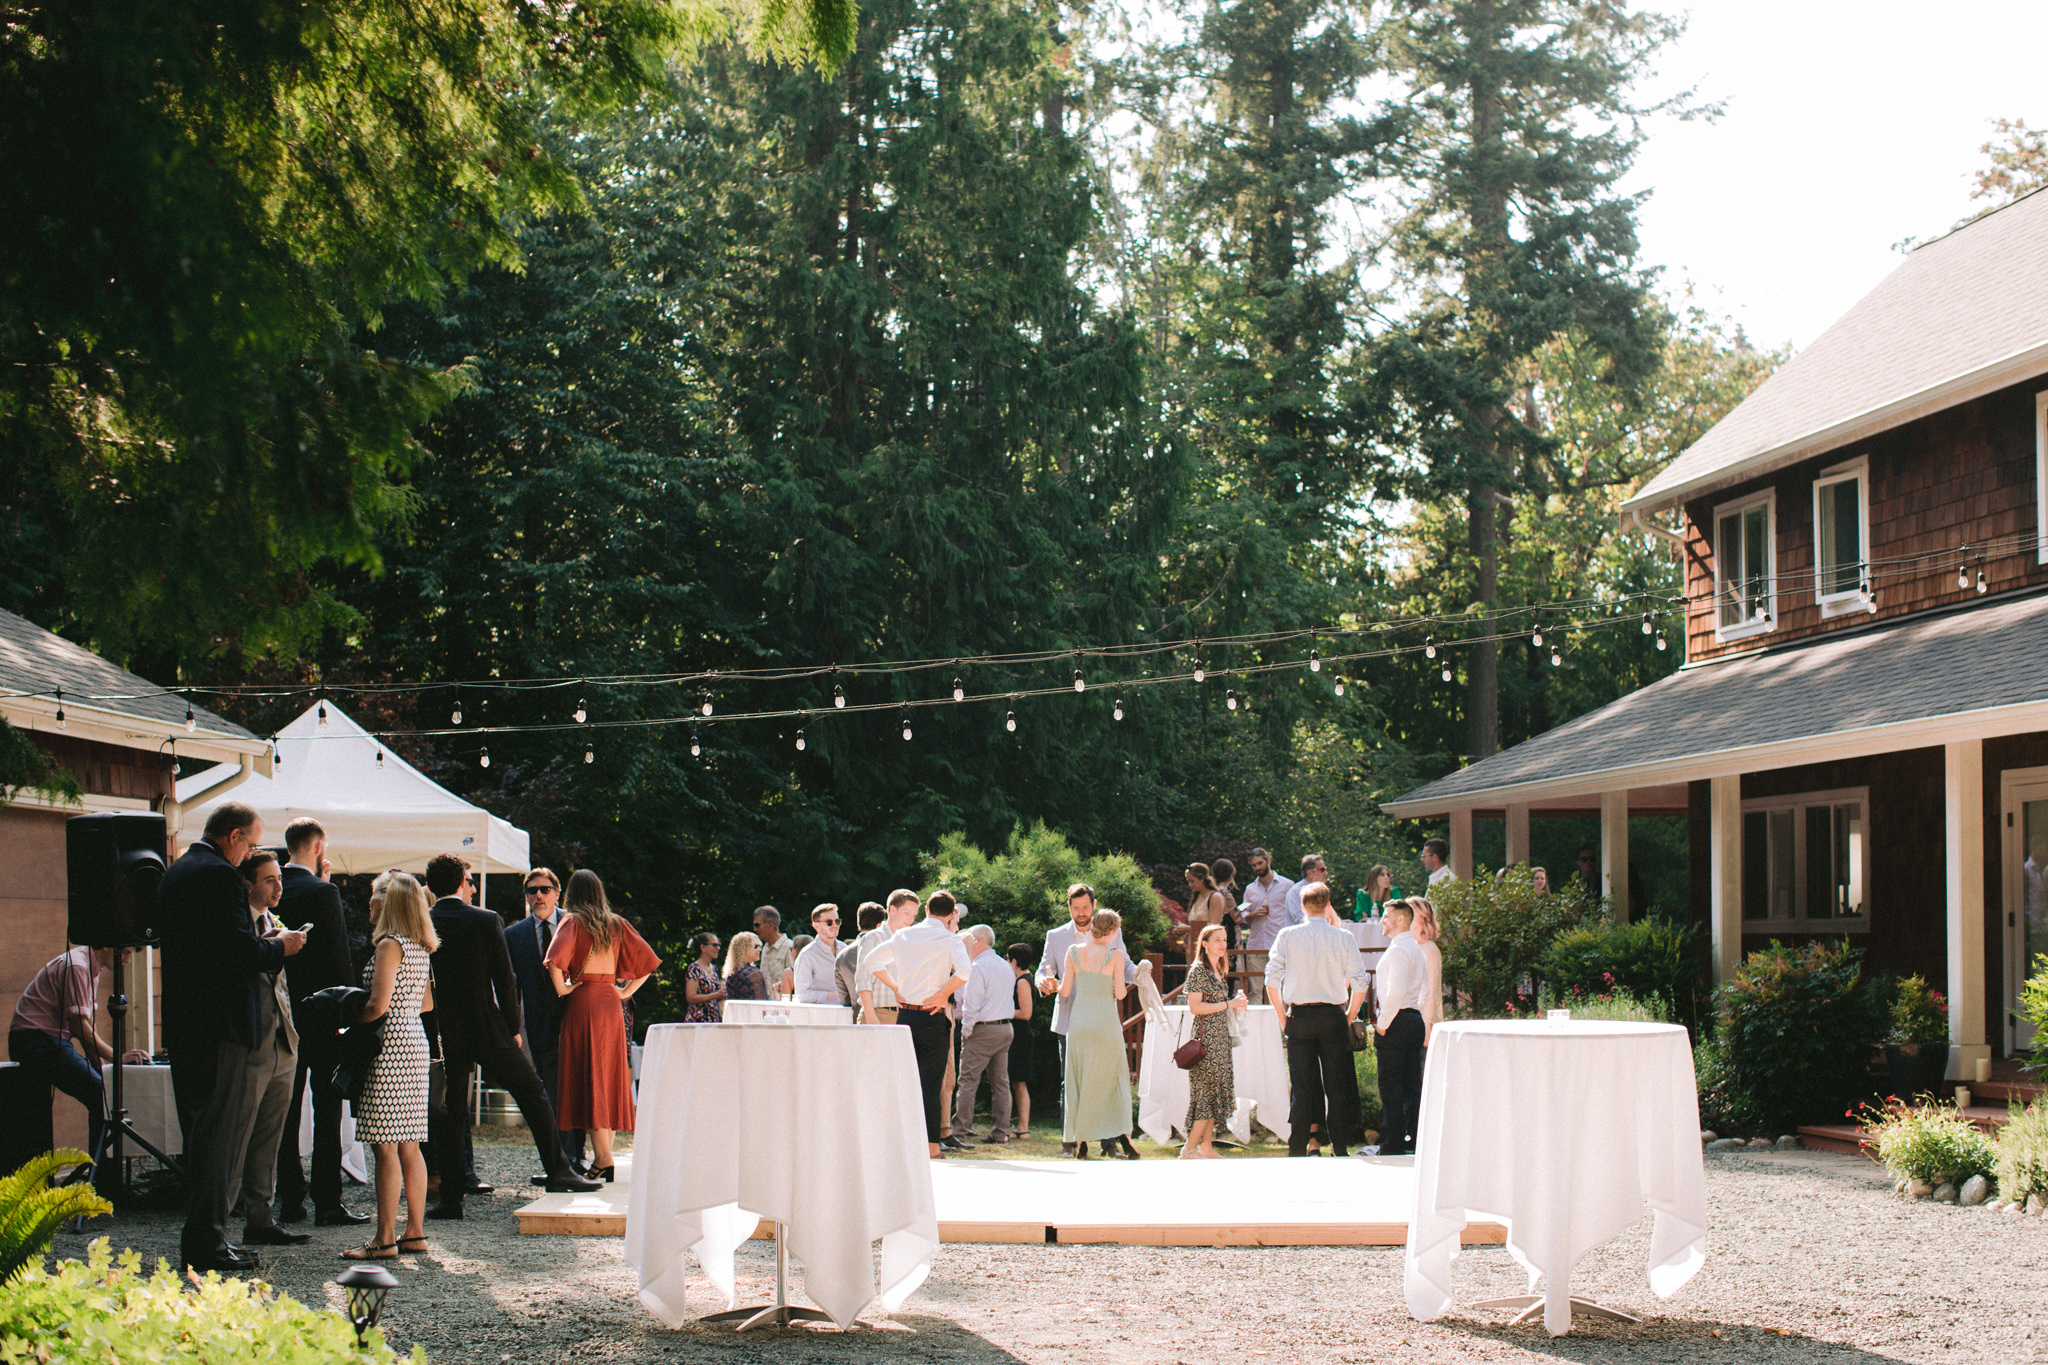 Backyard-Bainbridge-Island-Wedding-Alycia-Lovell-Photography-75.JPG